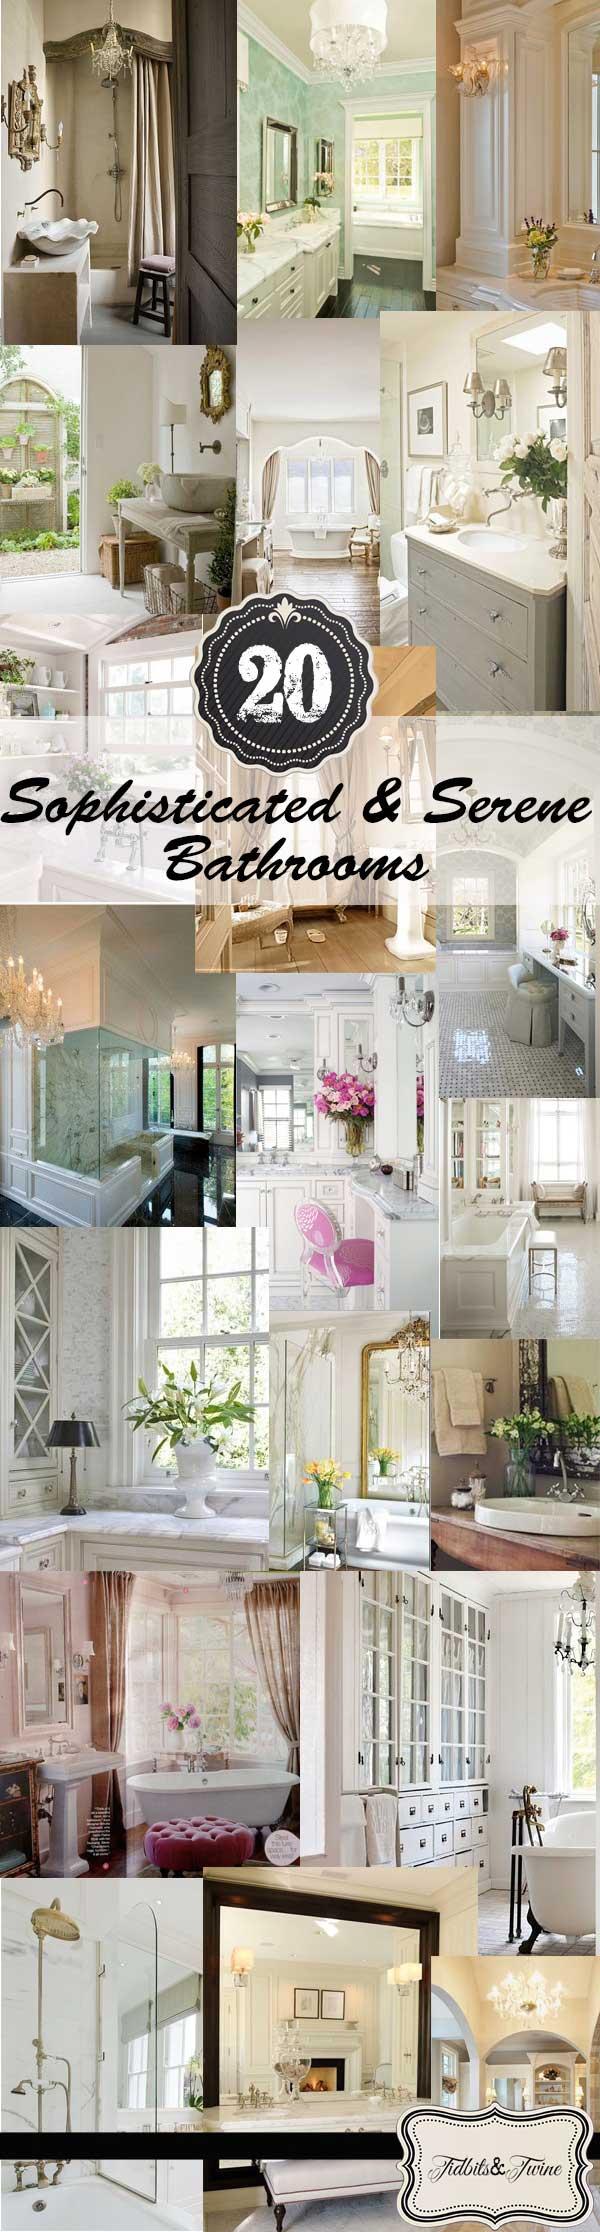 20 Sophisticated & Serene Bathrooms